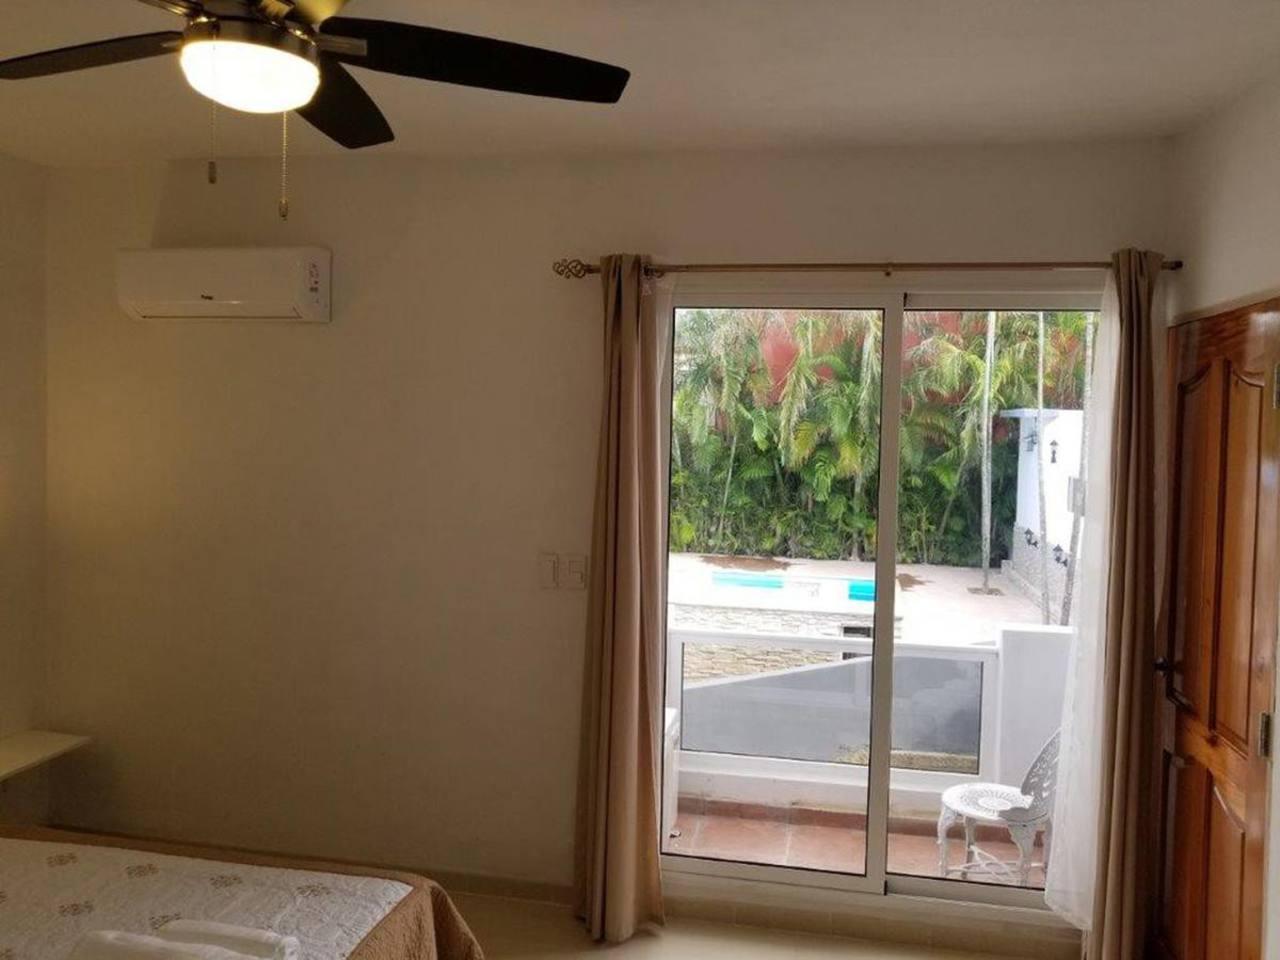 Villa Don Teto Suite & 8 Rooms: Great Havana View photo 5678685